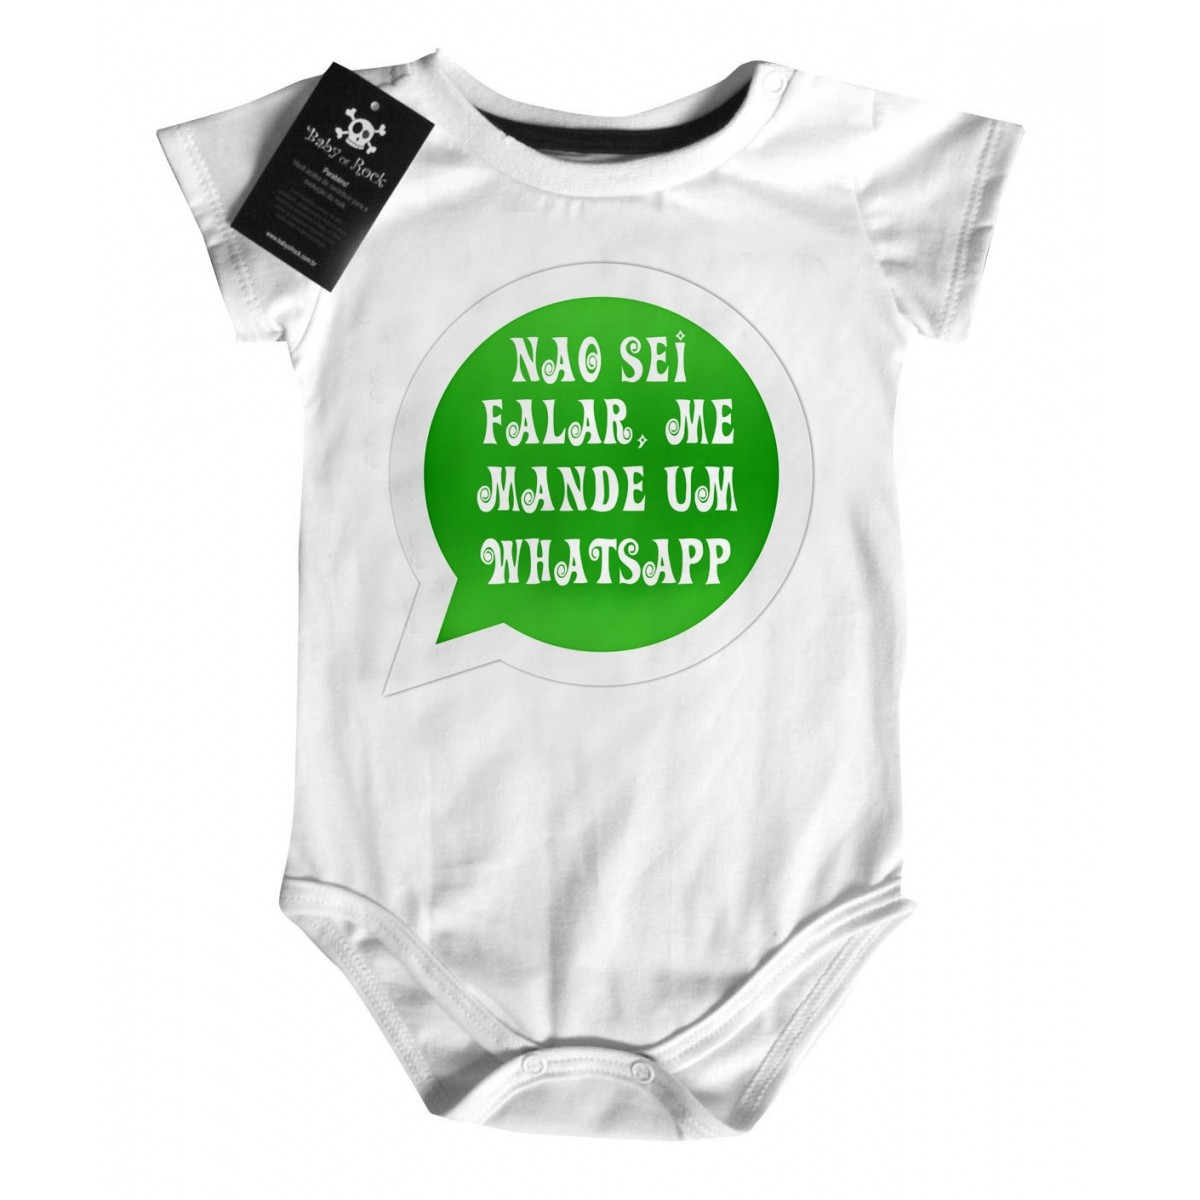 Body Divertido  Bebê - Whatsapp - White  - Baby Monster S/A